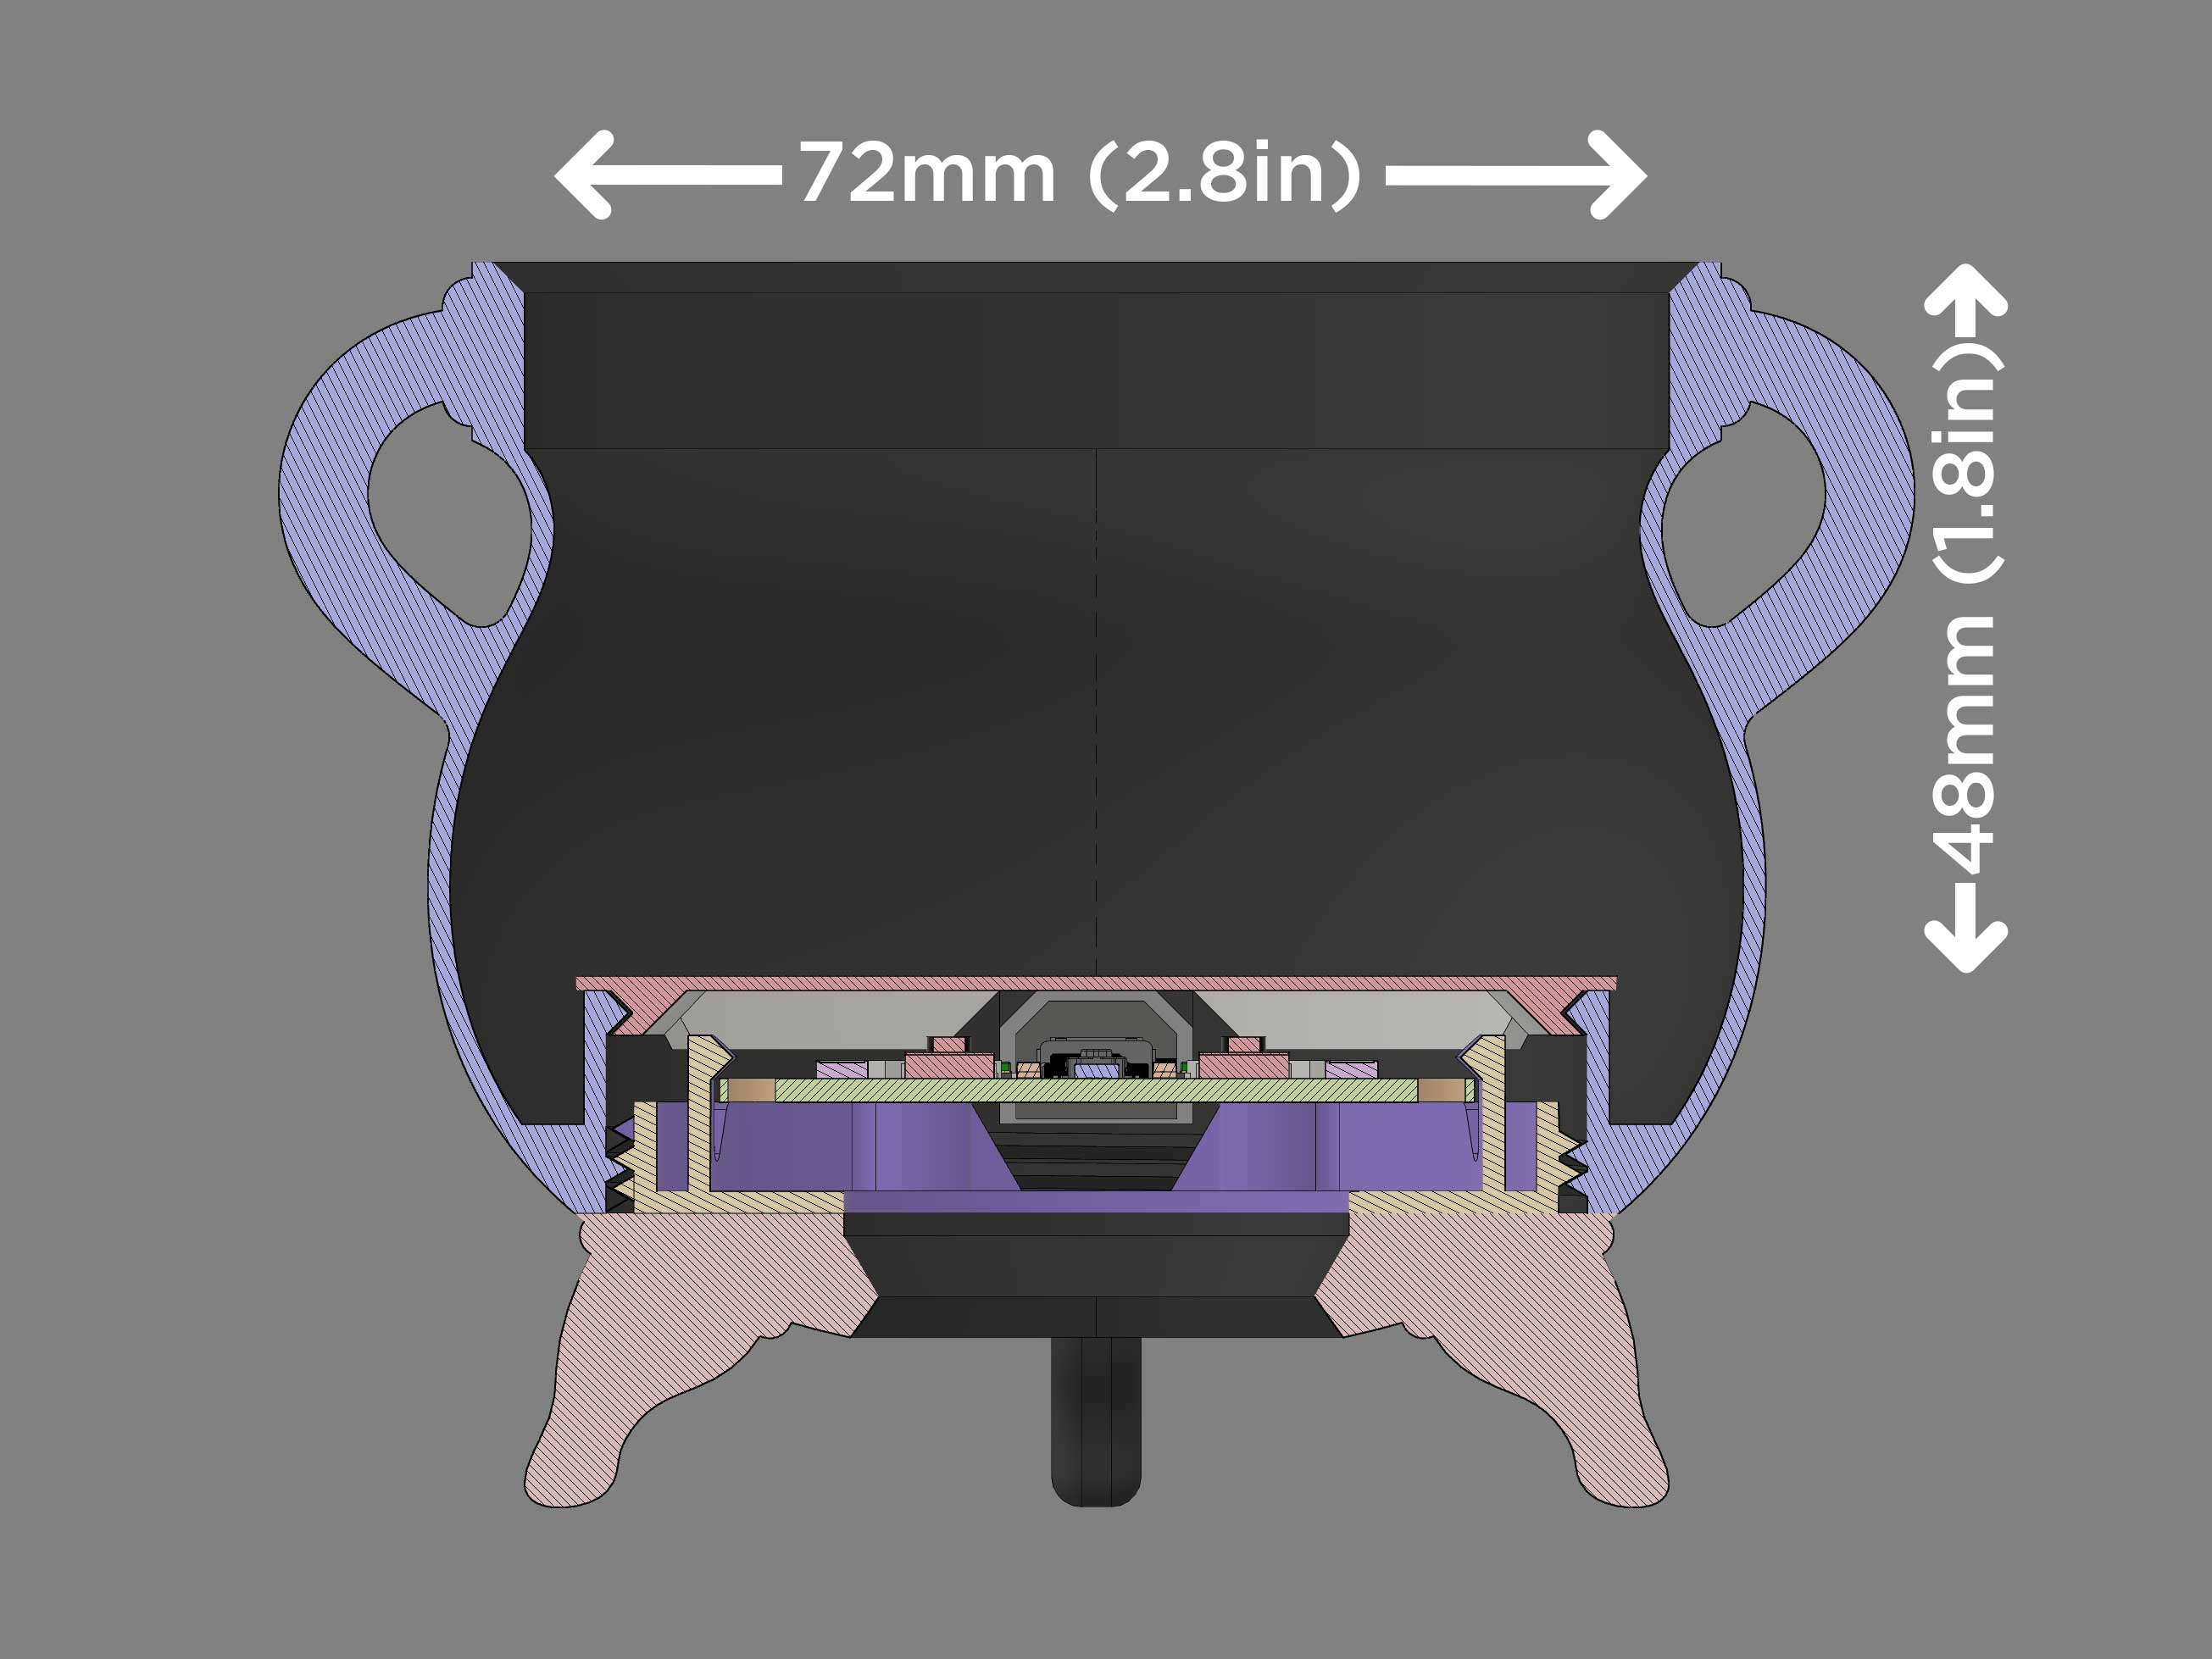 3d_printing_cad-cross-section.jpg